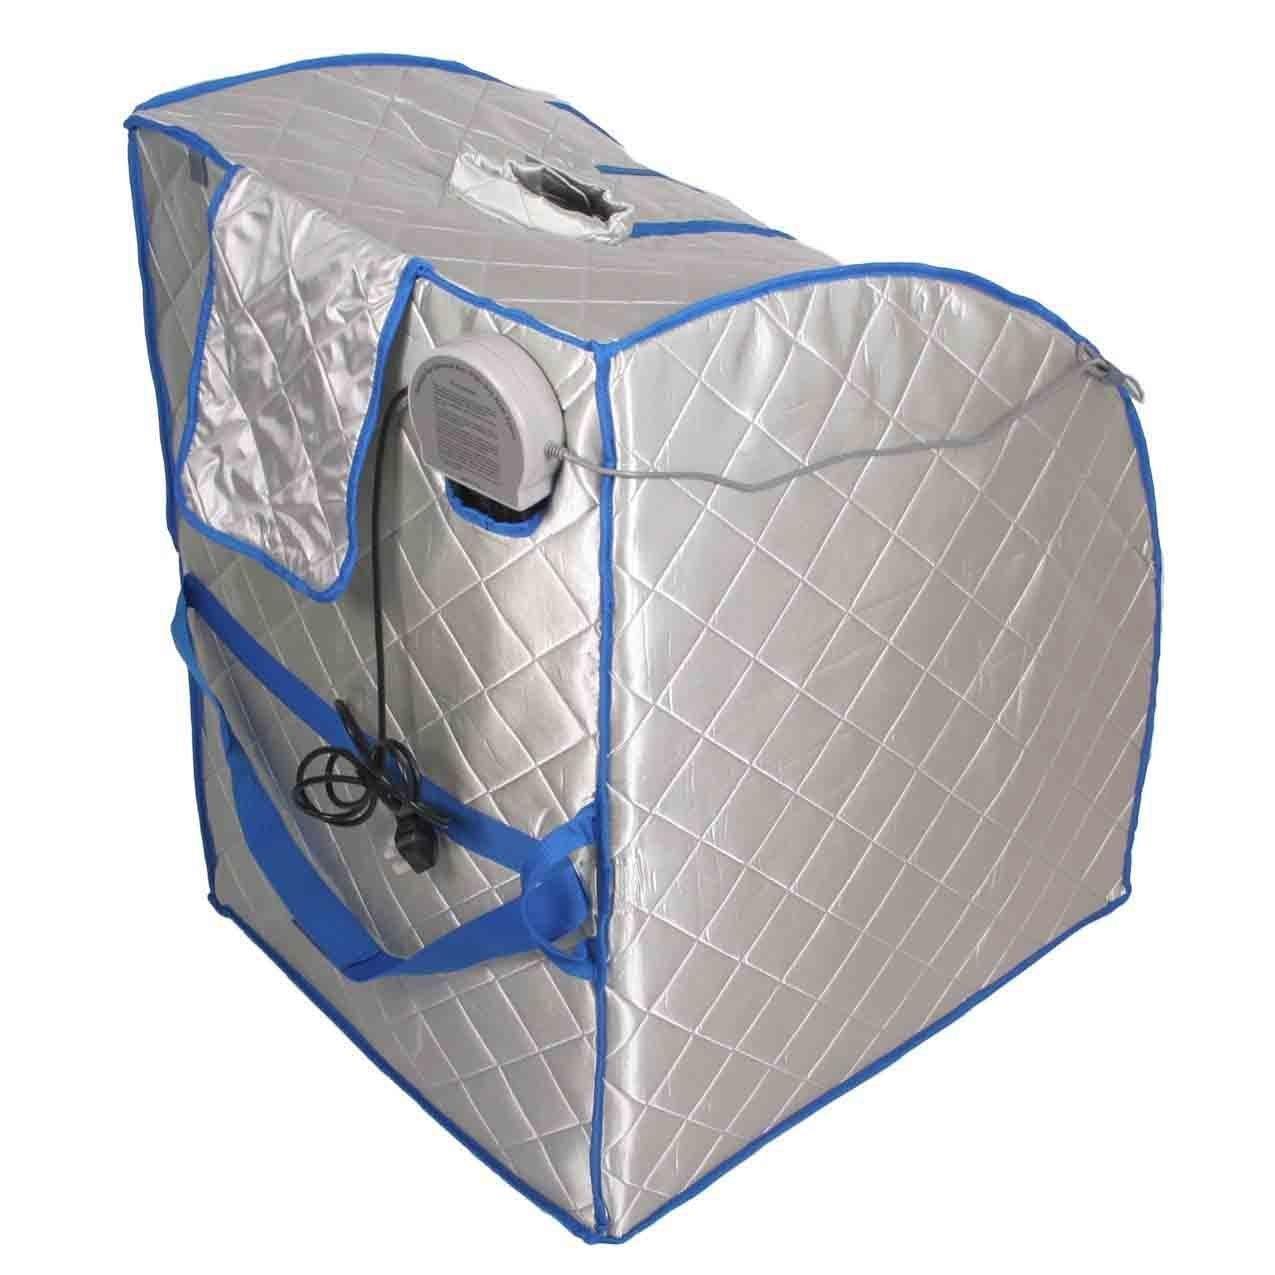 Gizmo Supply XL Infrared IR Portable Sauna 1000W Gizmo Supply Co.